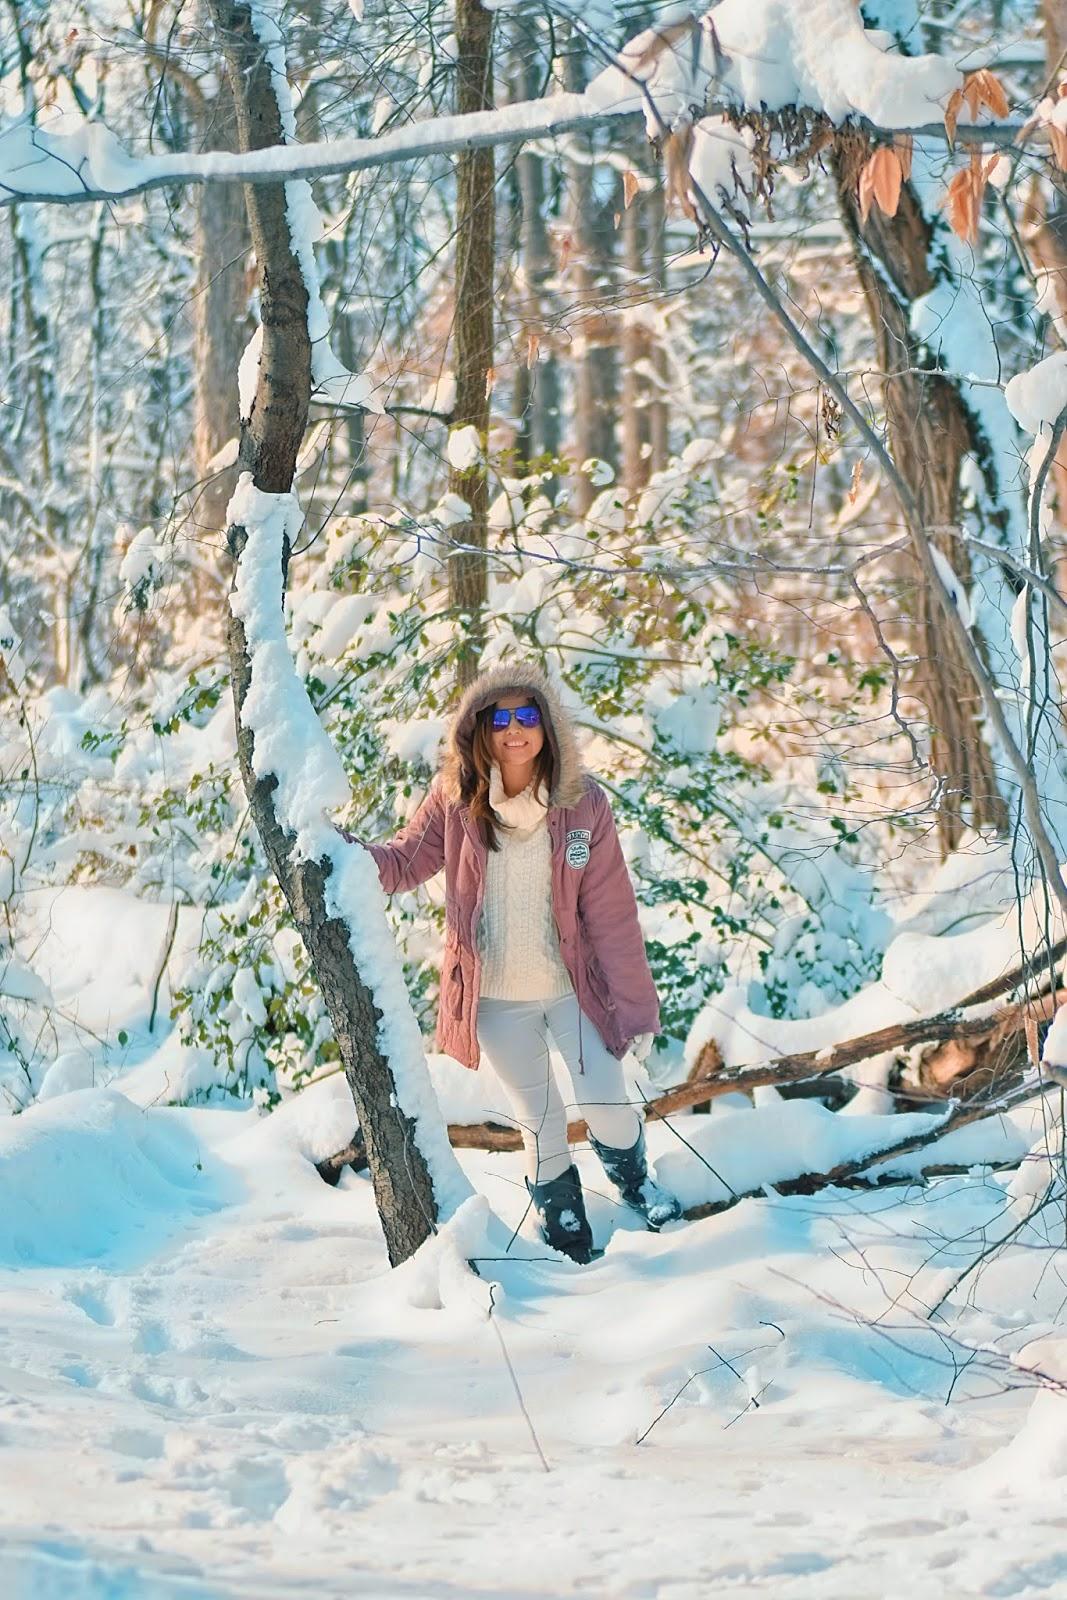 Faux Fur Hood Parka Coat-MariEstilo-winterwonderland-winter-snowday-travelblogger-shein-dcblogger-wanderlust-wanter-mountain view-